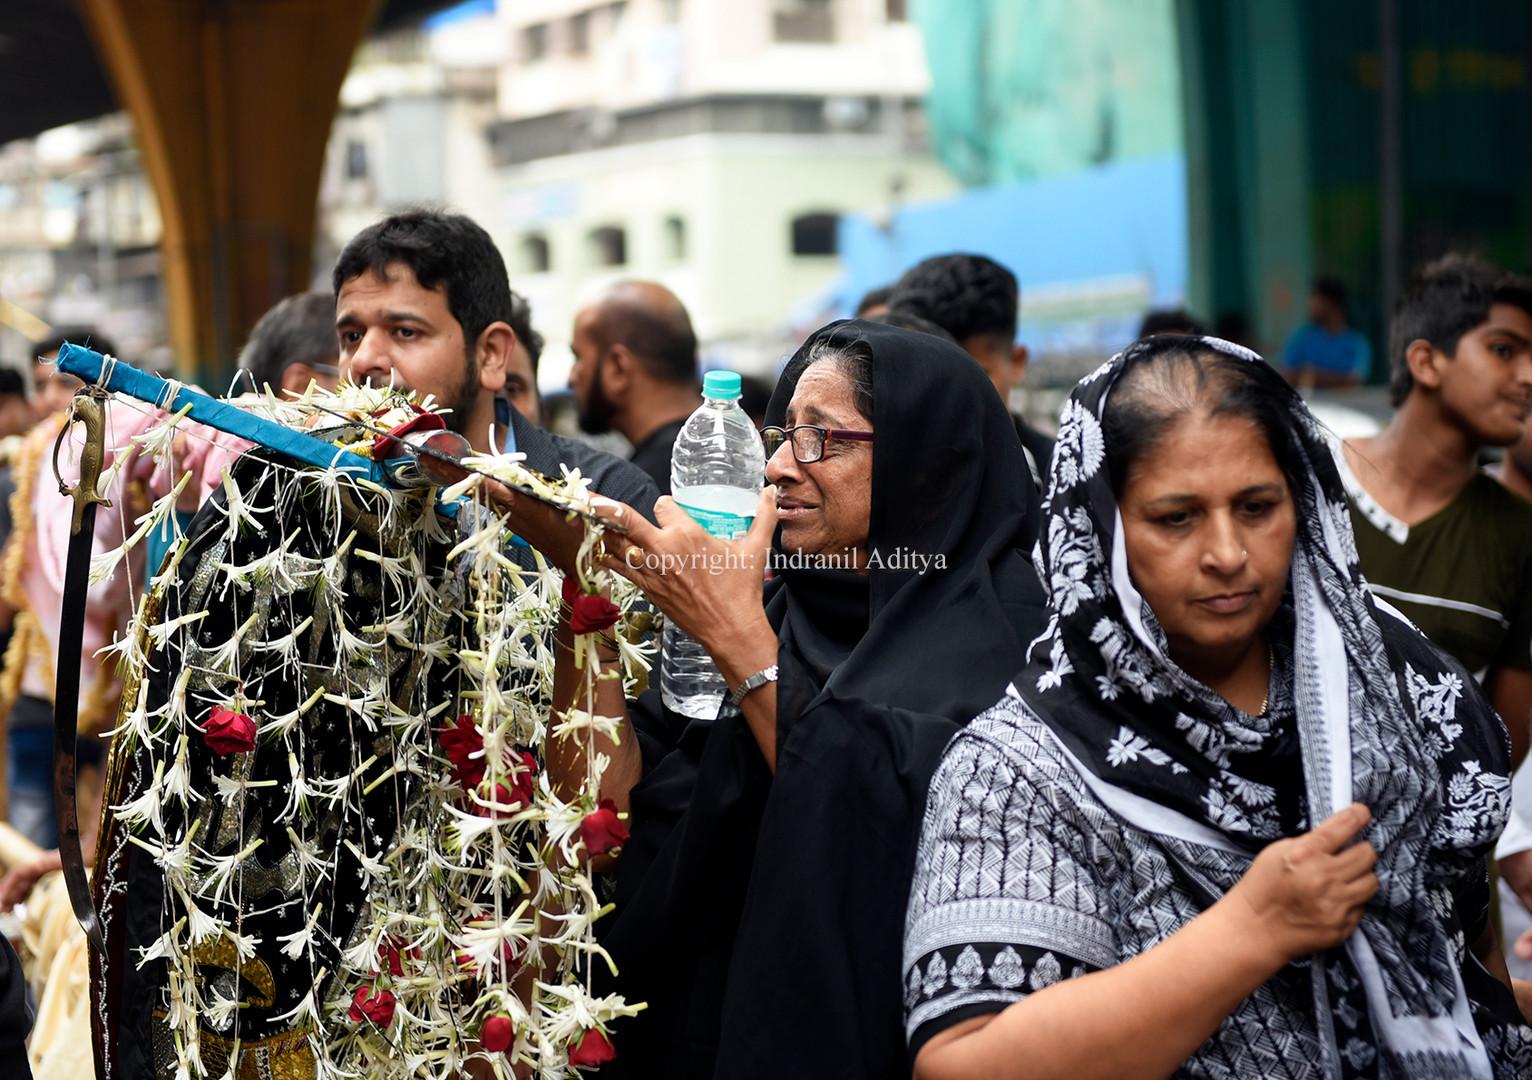 A woman mourns during Muharram